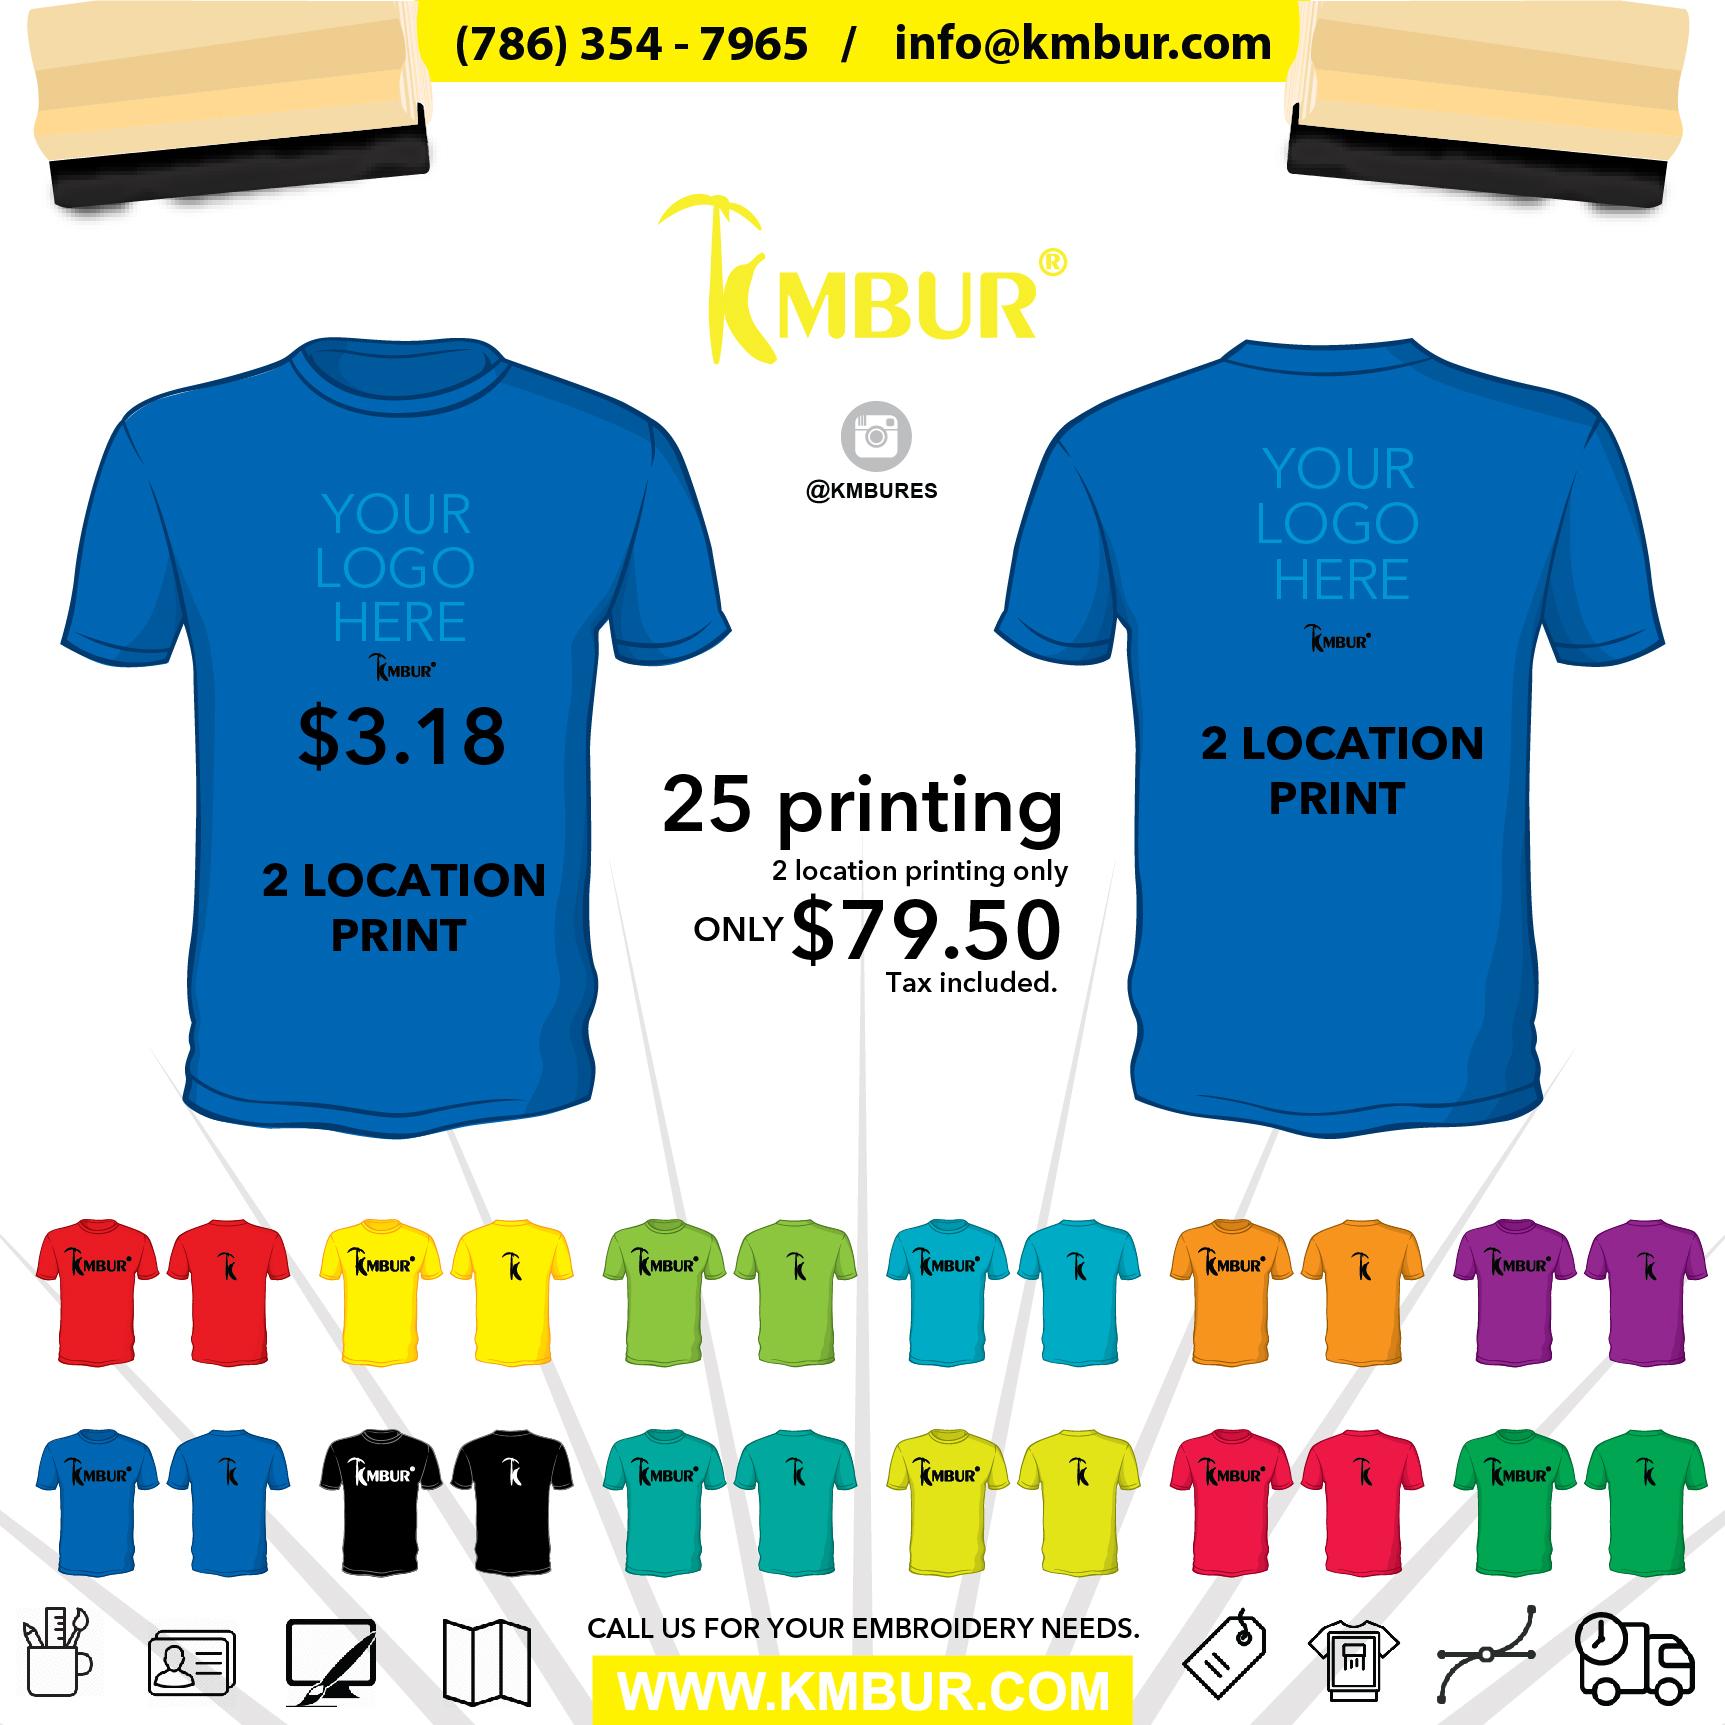 KMBUR Deal 2 location print-01